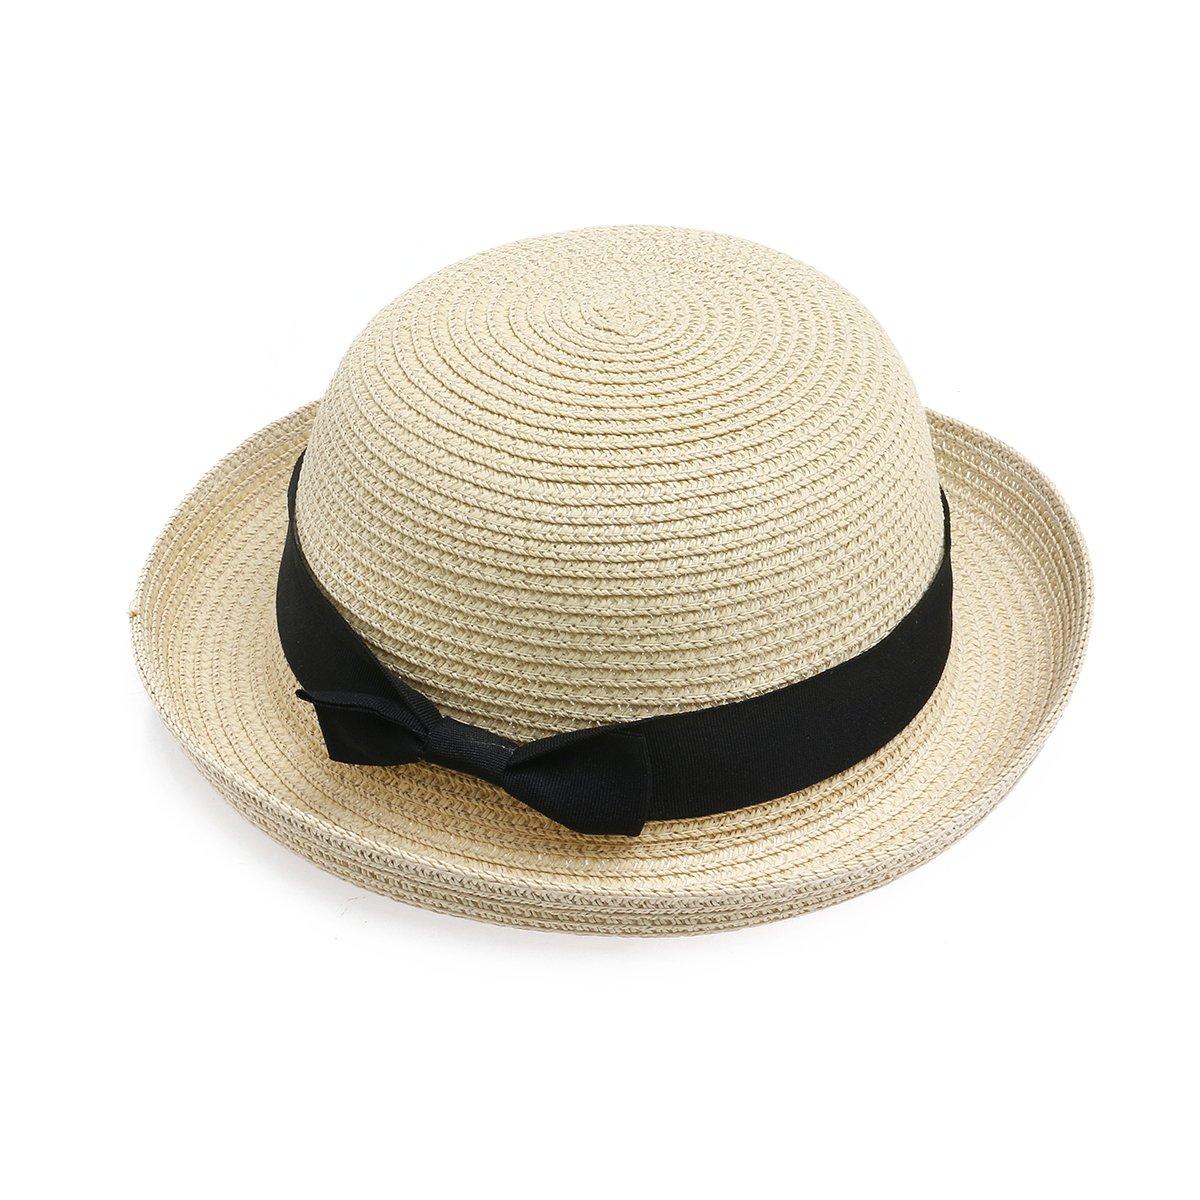 NUOLUX Fashion Women's Girls Bowknot Roll-up Wide Brim Dome Straw Summer Sun Hat Bowler Beach Cap (Beige)